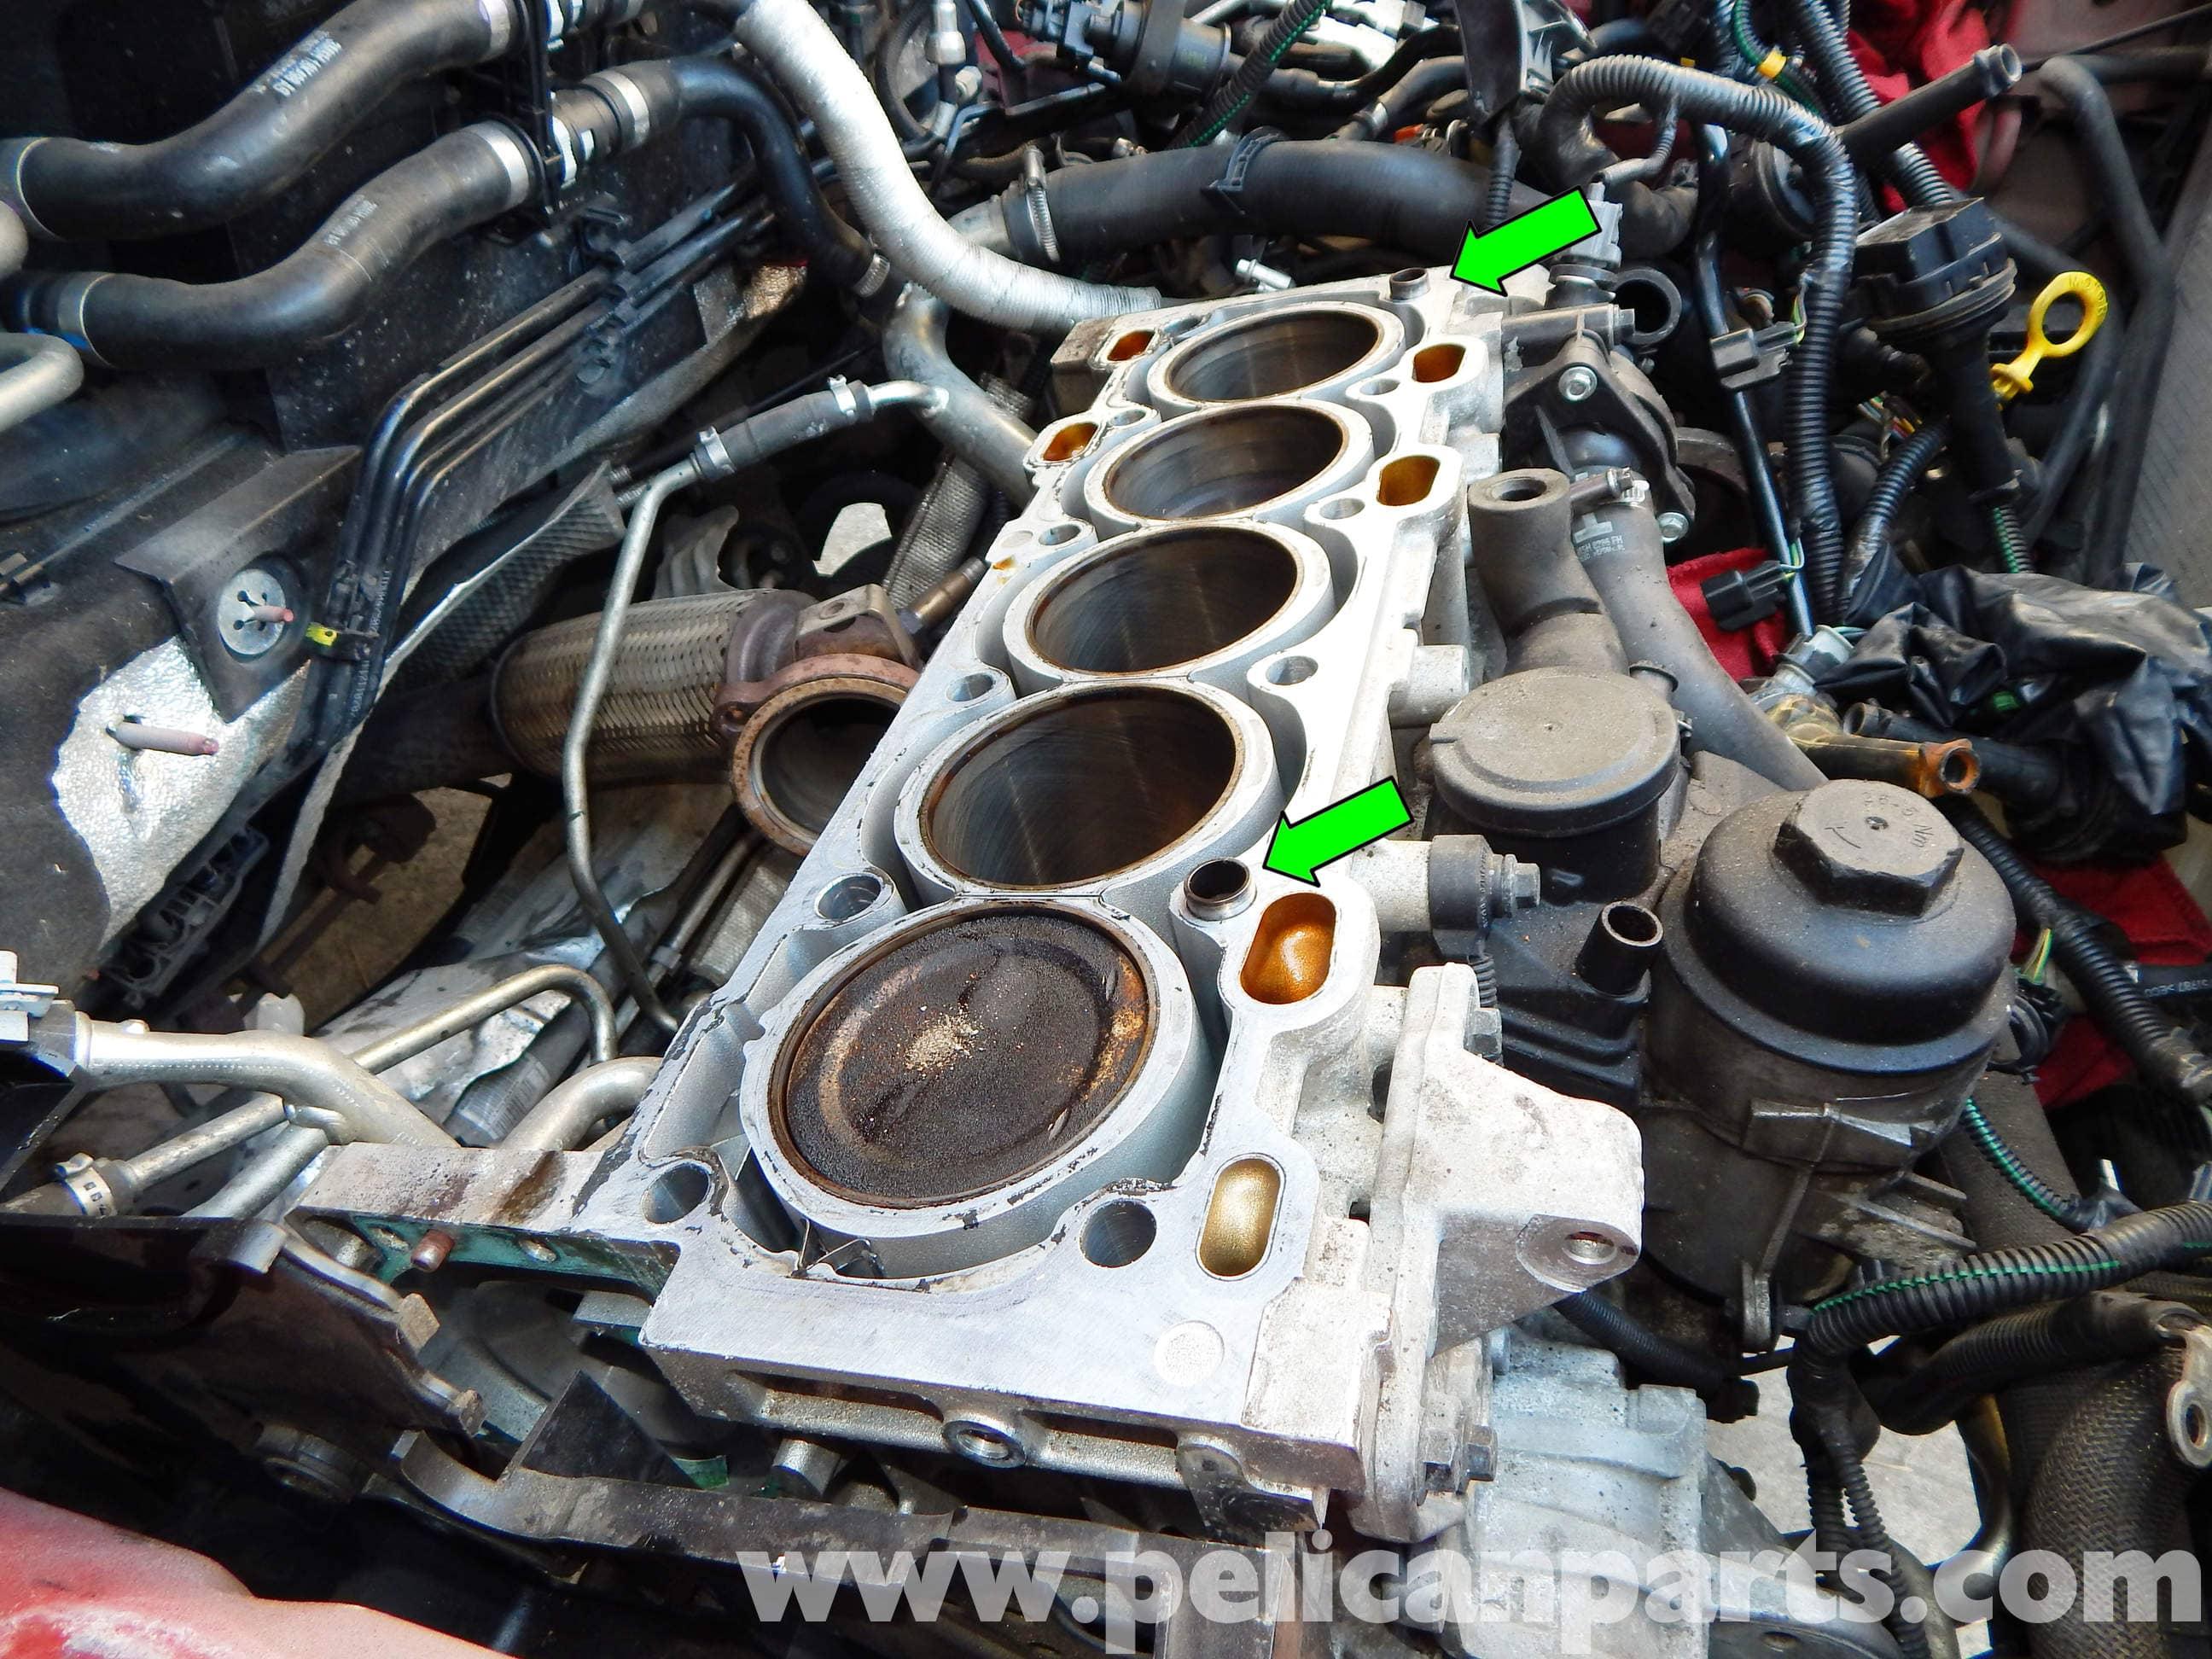 Volvo C30 Cylinder Head Gasket Replacement | C30 (2007 ...